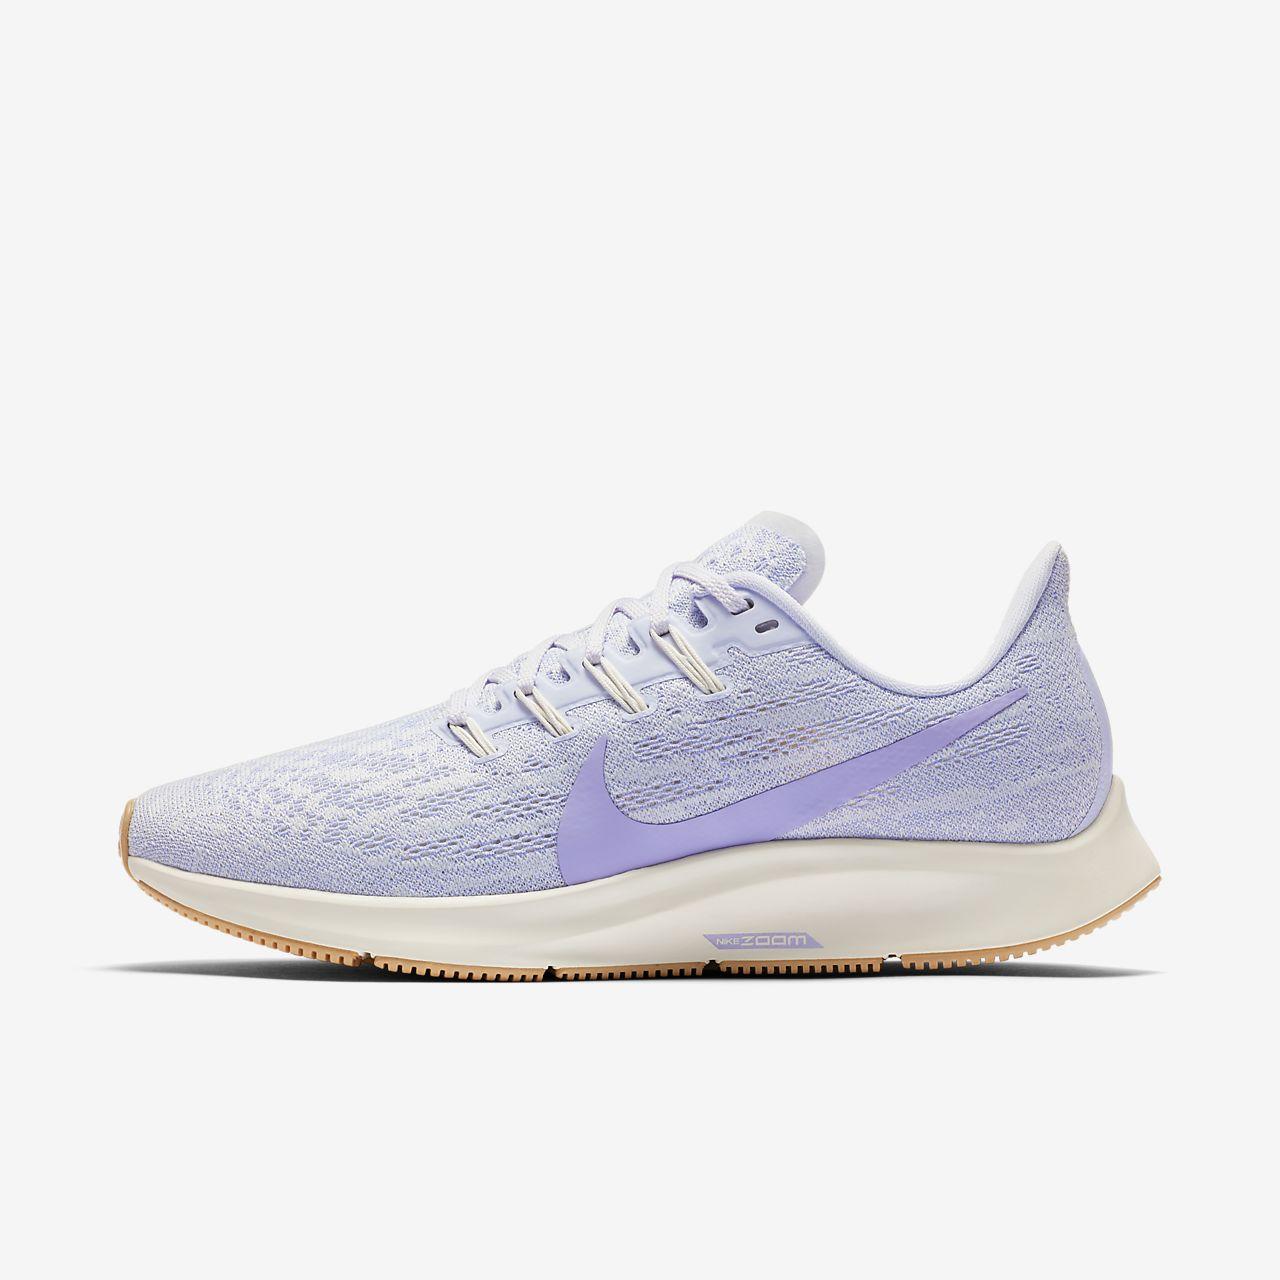 Nike Air Zoom Pegasus 36 Zapatillas de running - Mujer